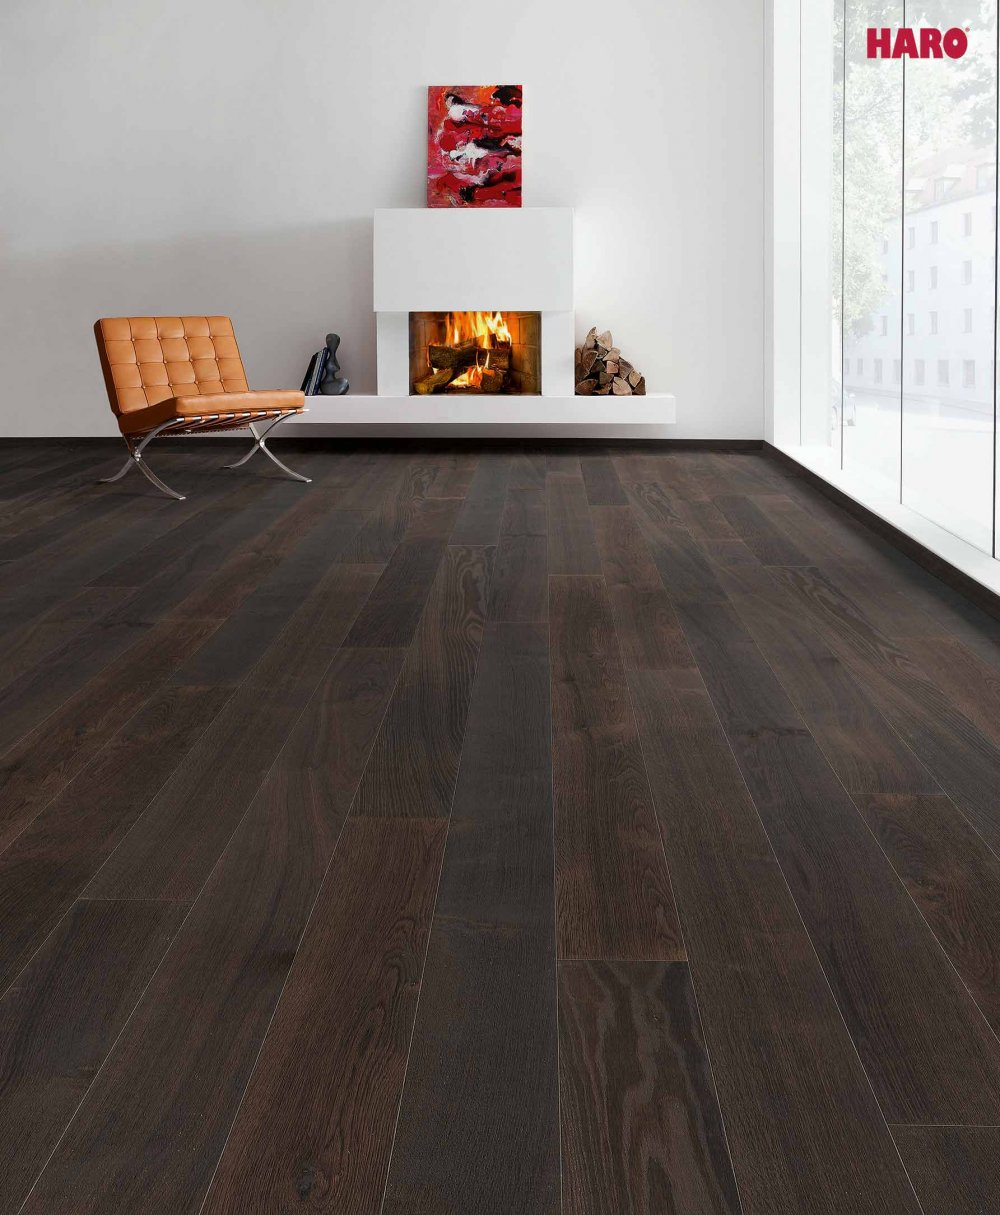 haro parkett landhausdiele 4000 achateiche 4v fase natur ge lt ebay. Black Bedroom Furniture Sets. Home Design Ideas